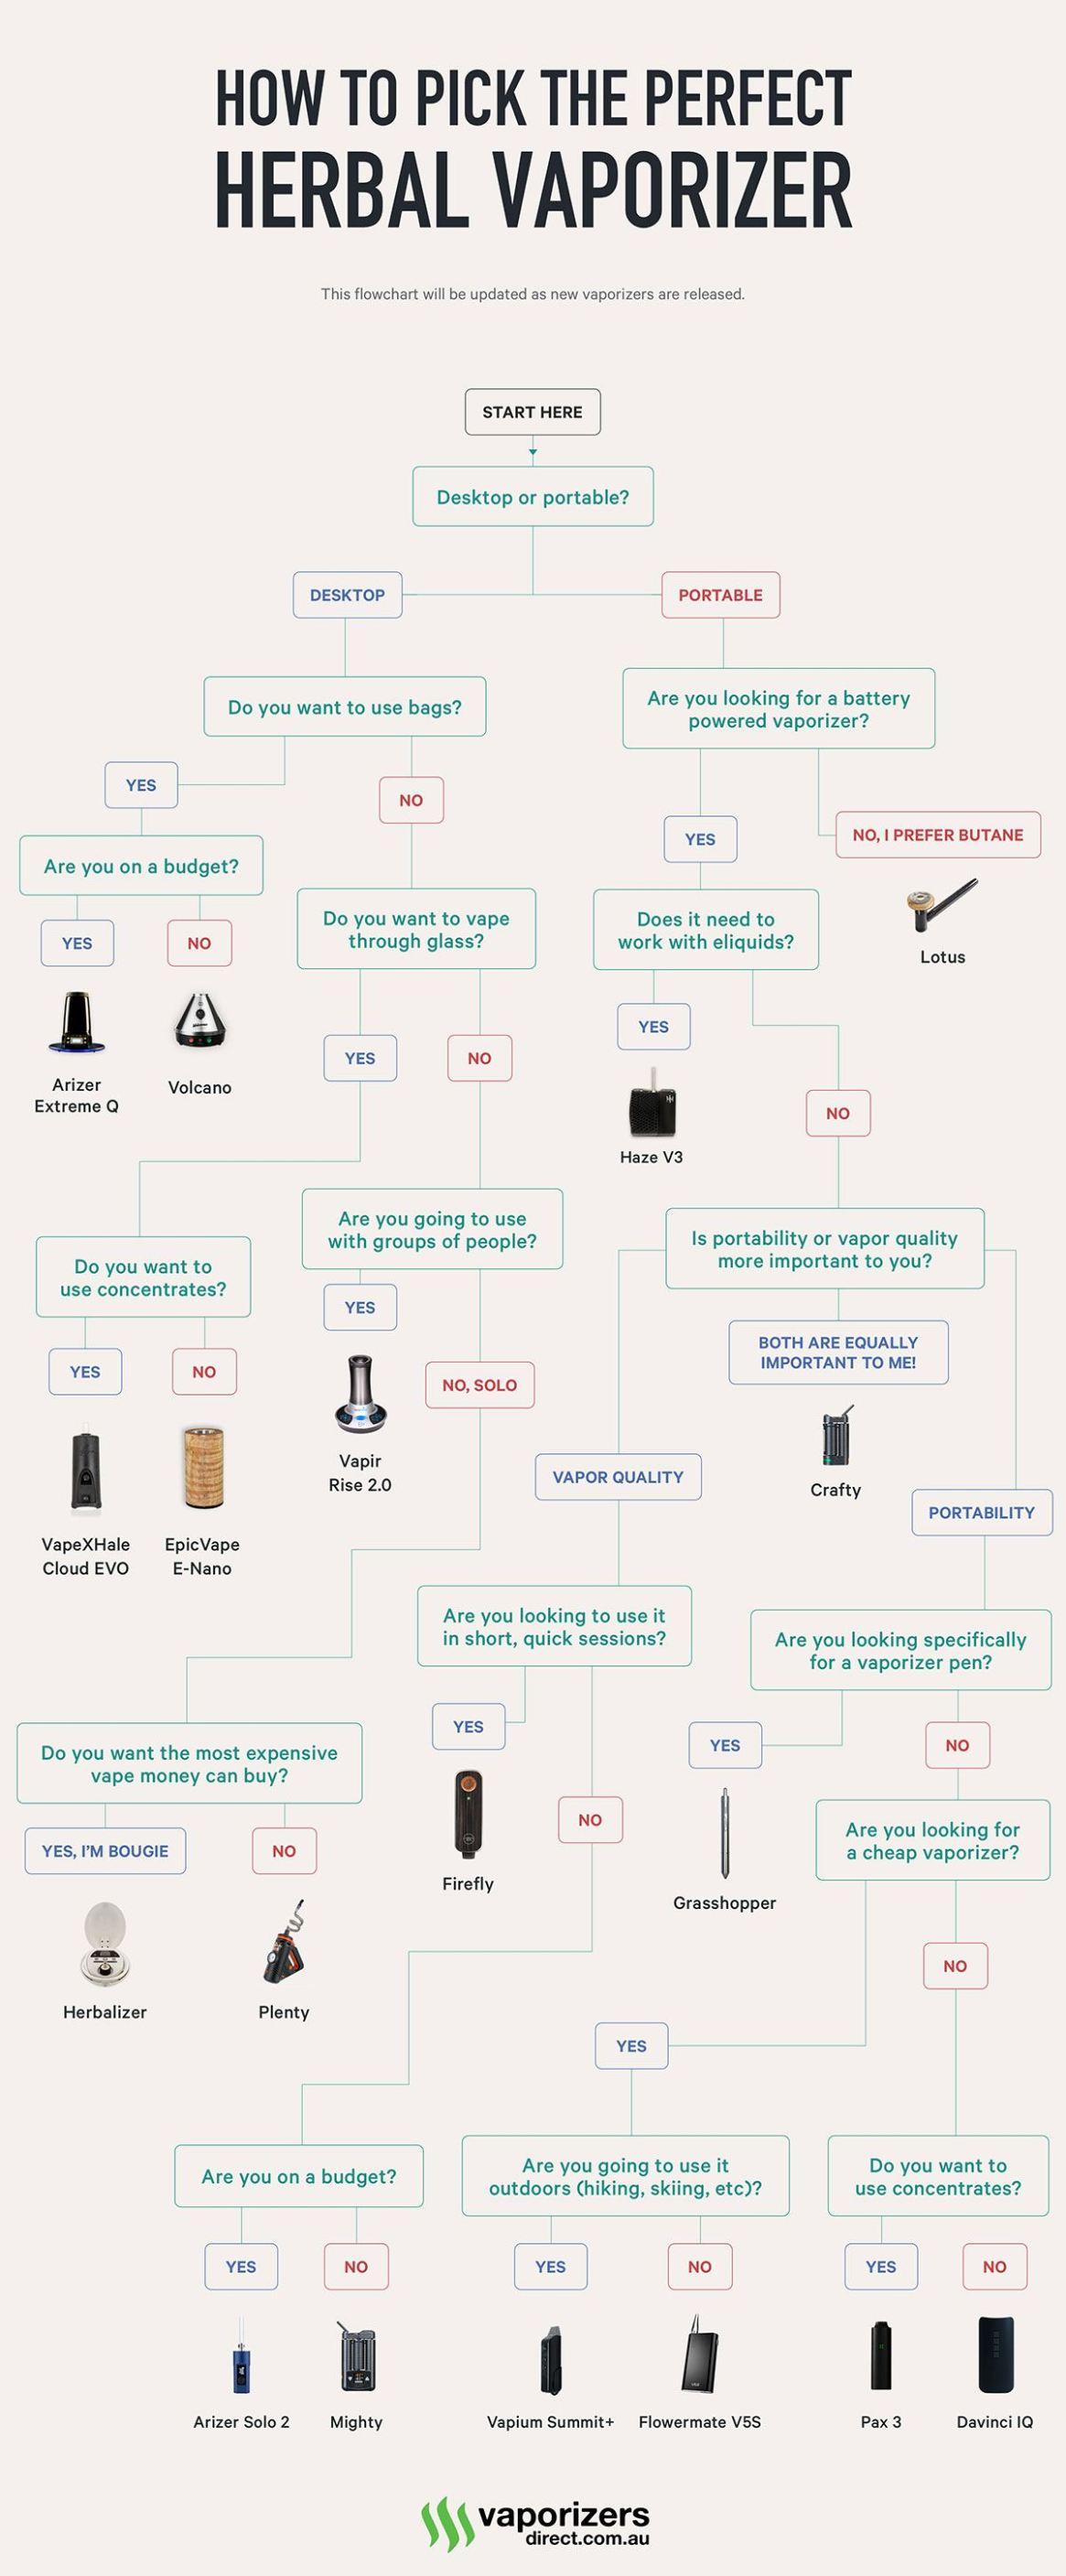 Vaporizer Buying Guide (Flowchart)